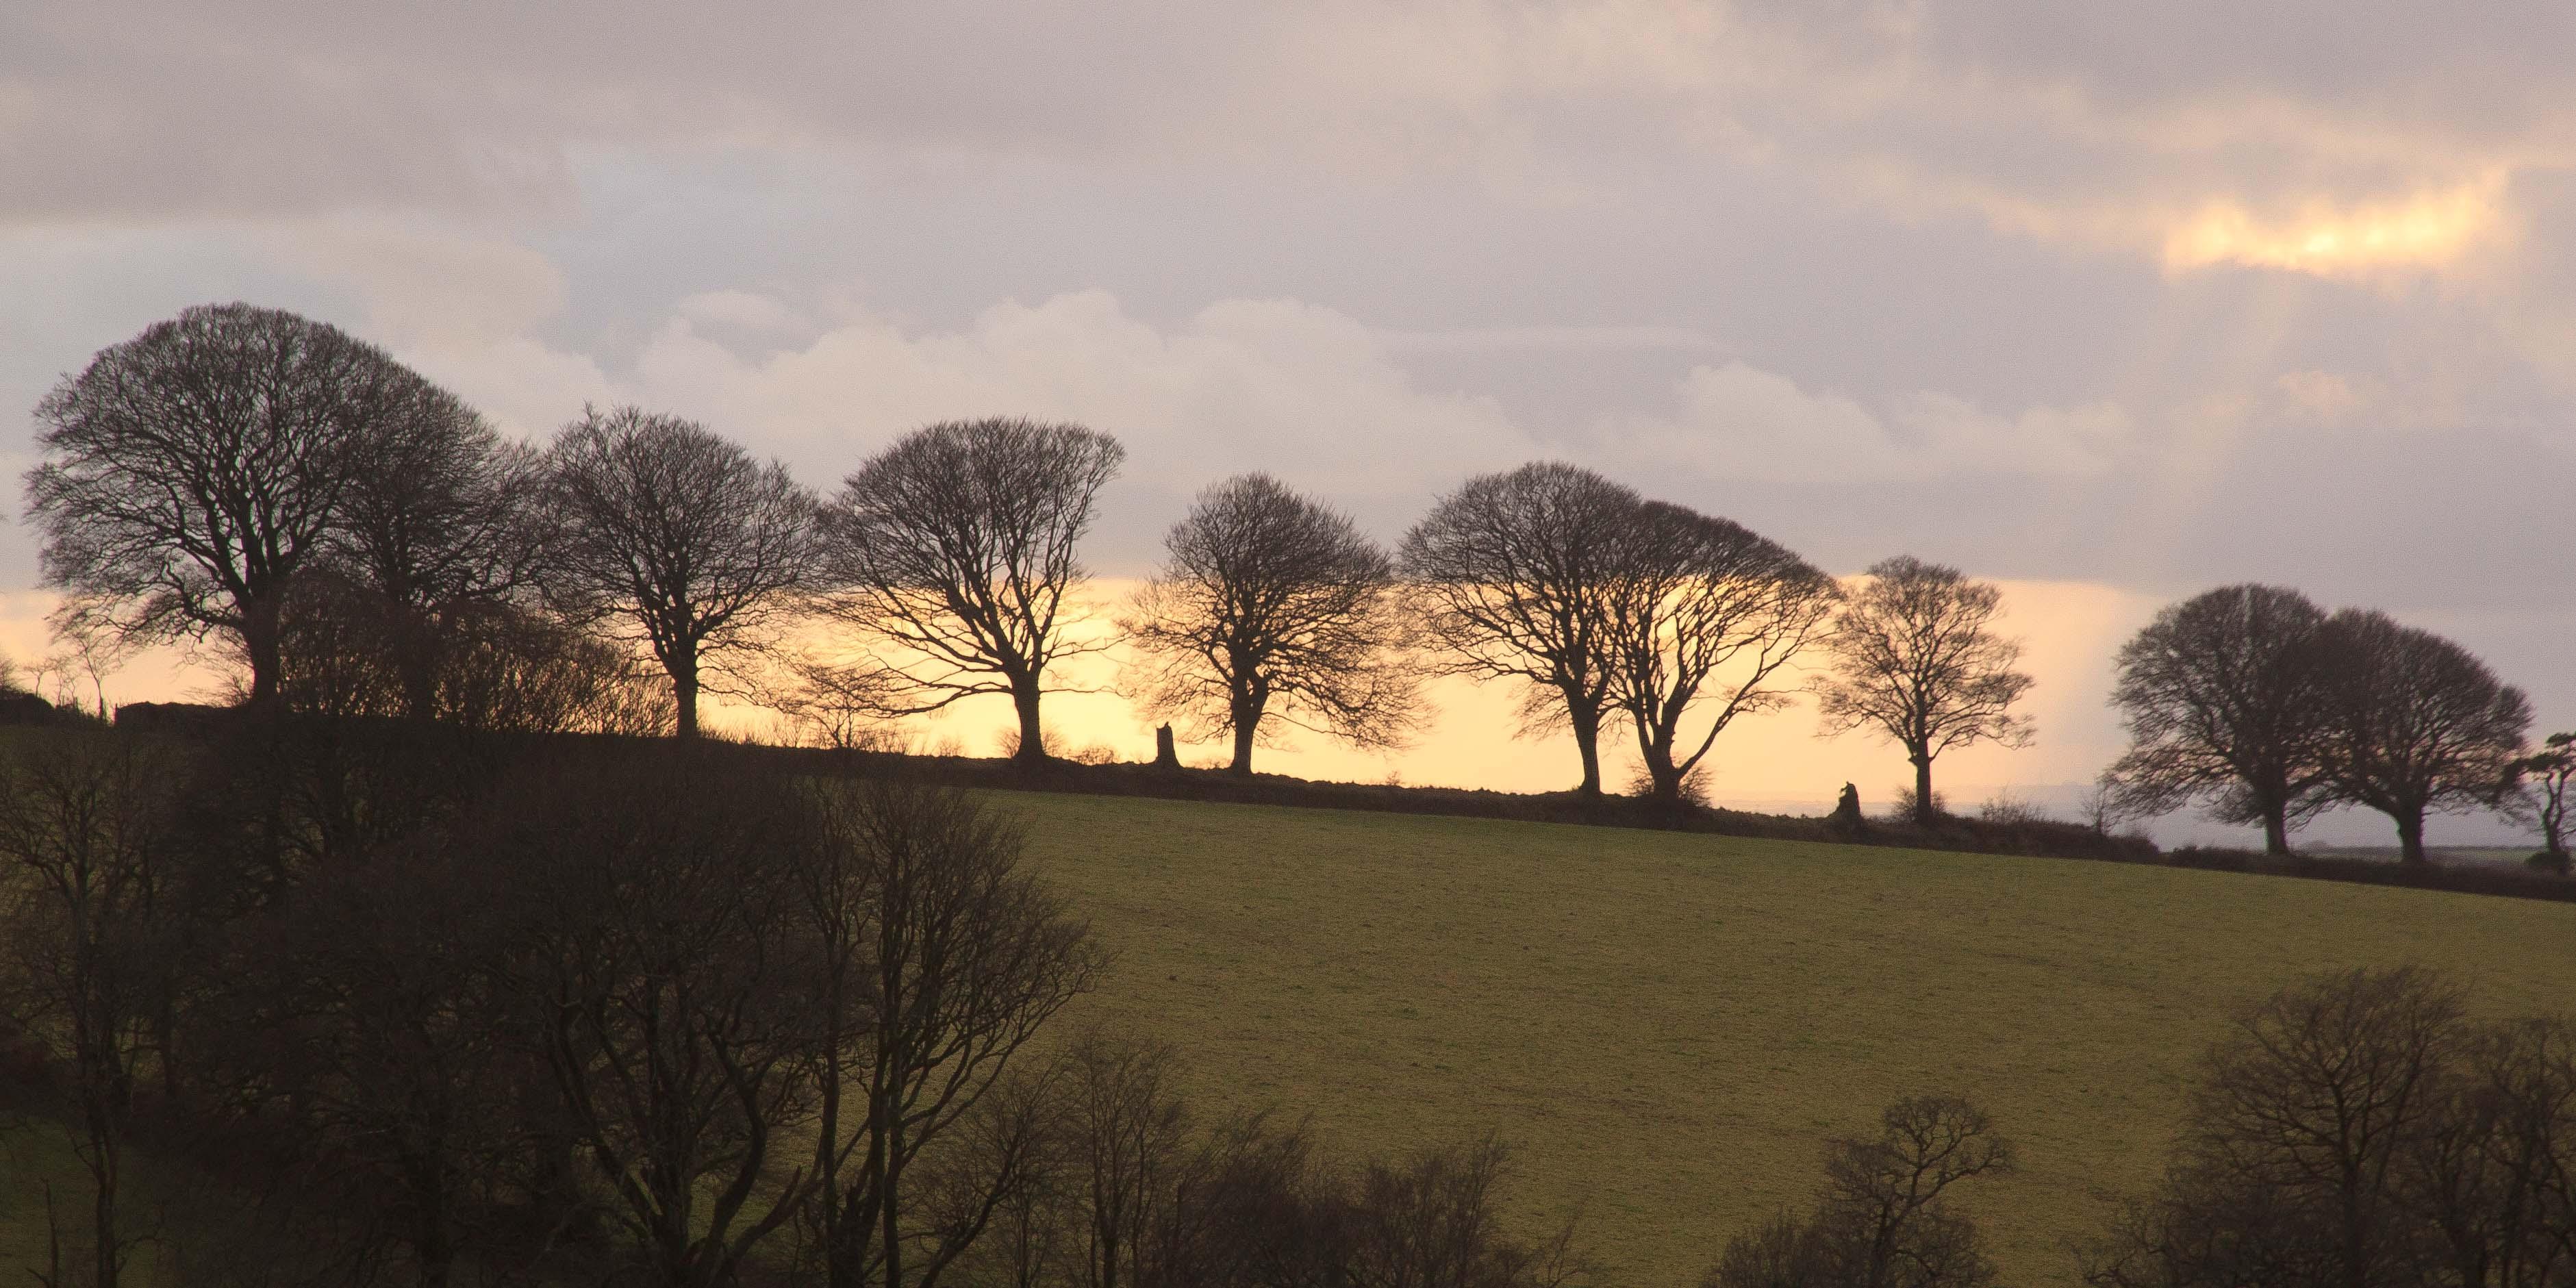 Trees silhouetted against the setting sun near Arlington Court, North Devon. Jan 2015